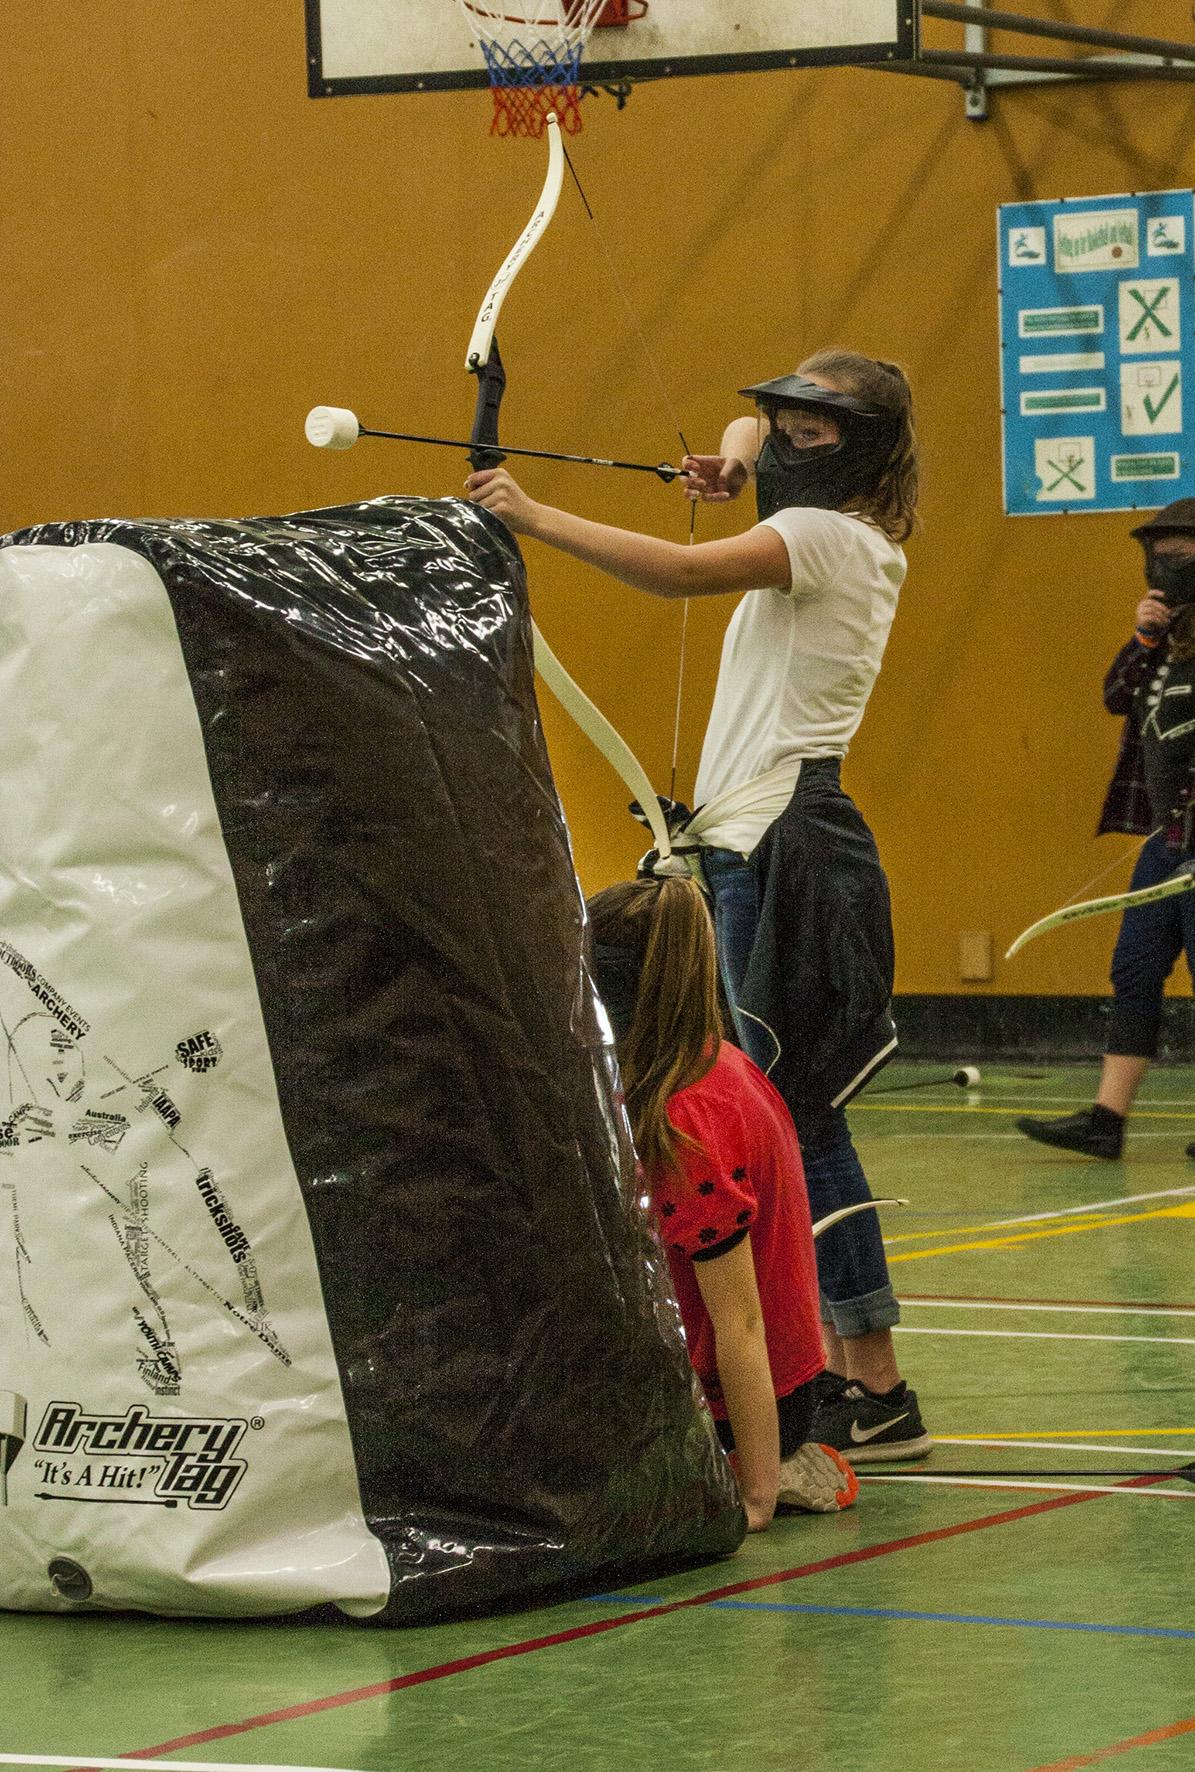 Archery Tag 29 April 2017 07